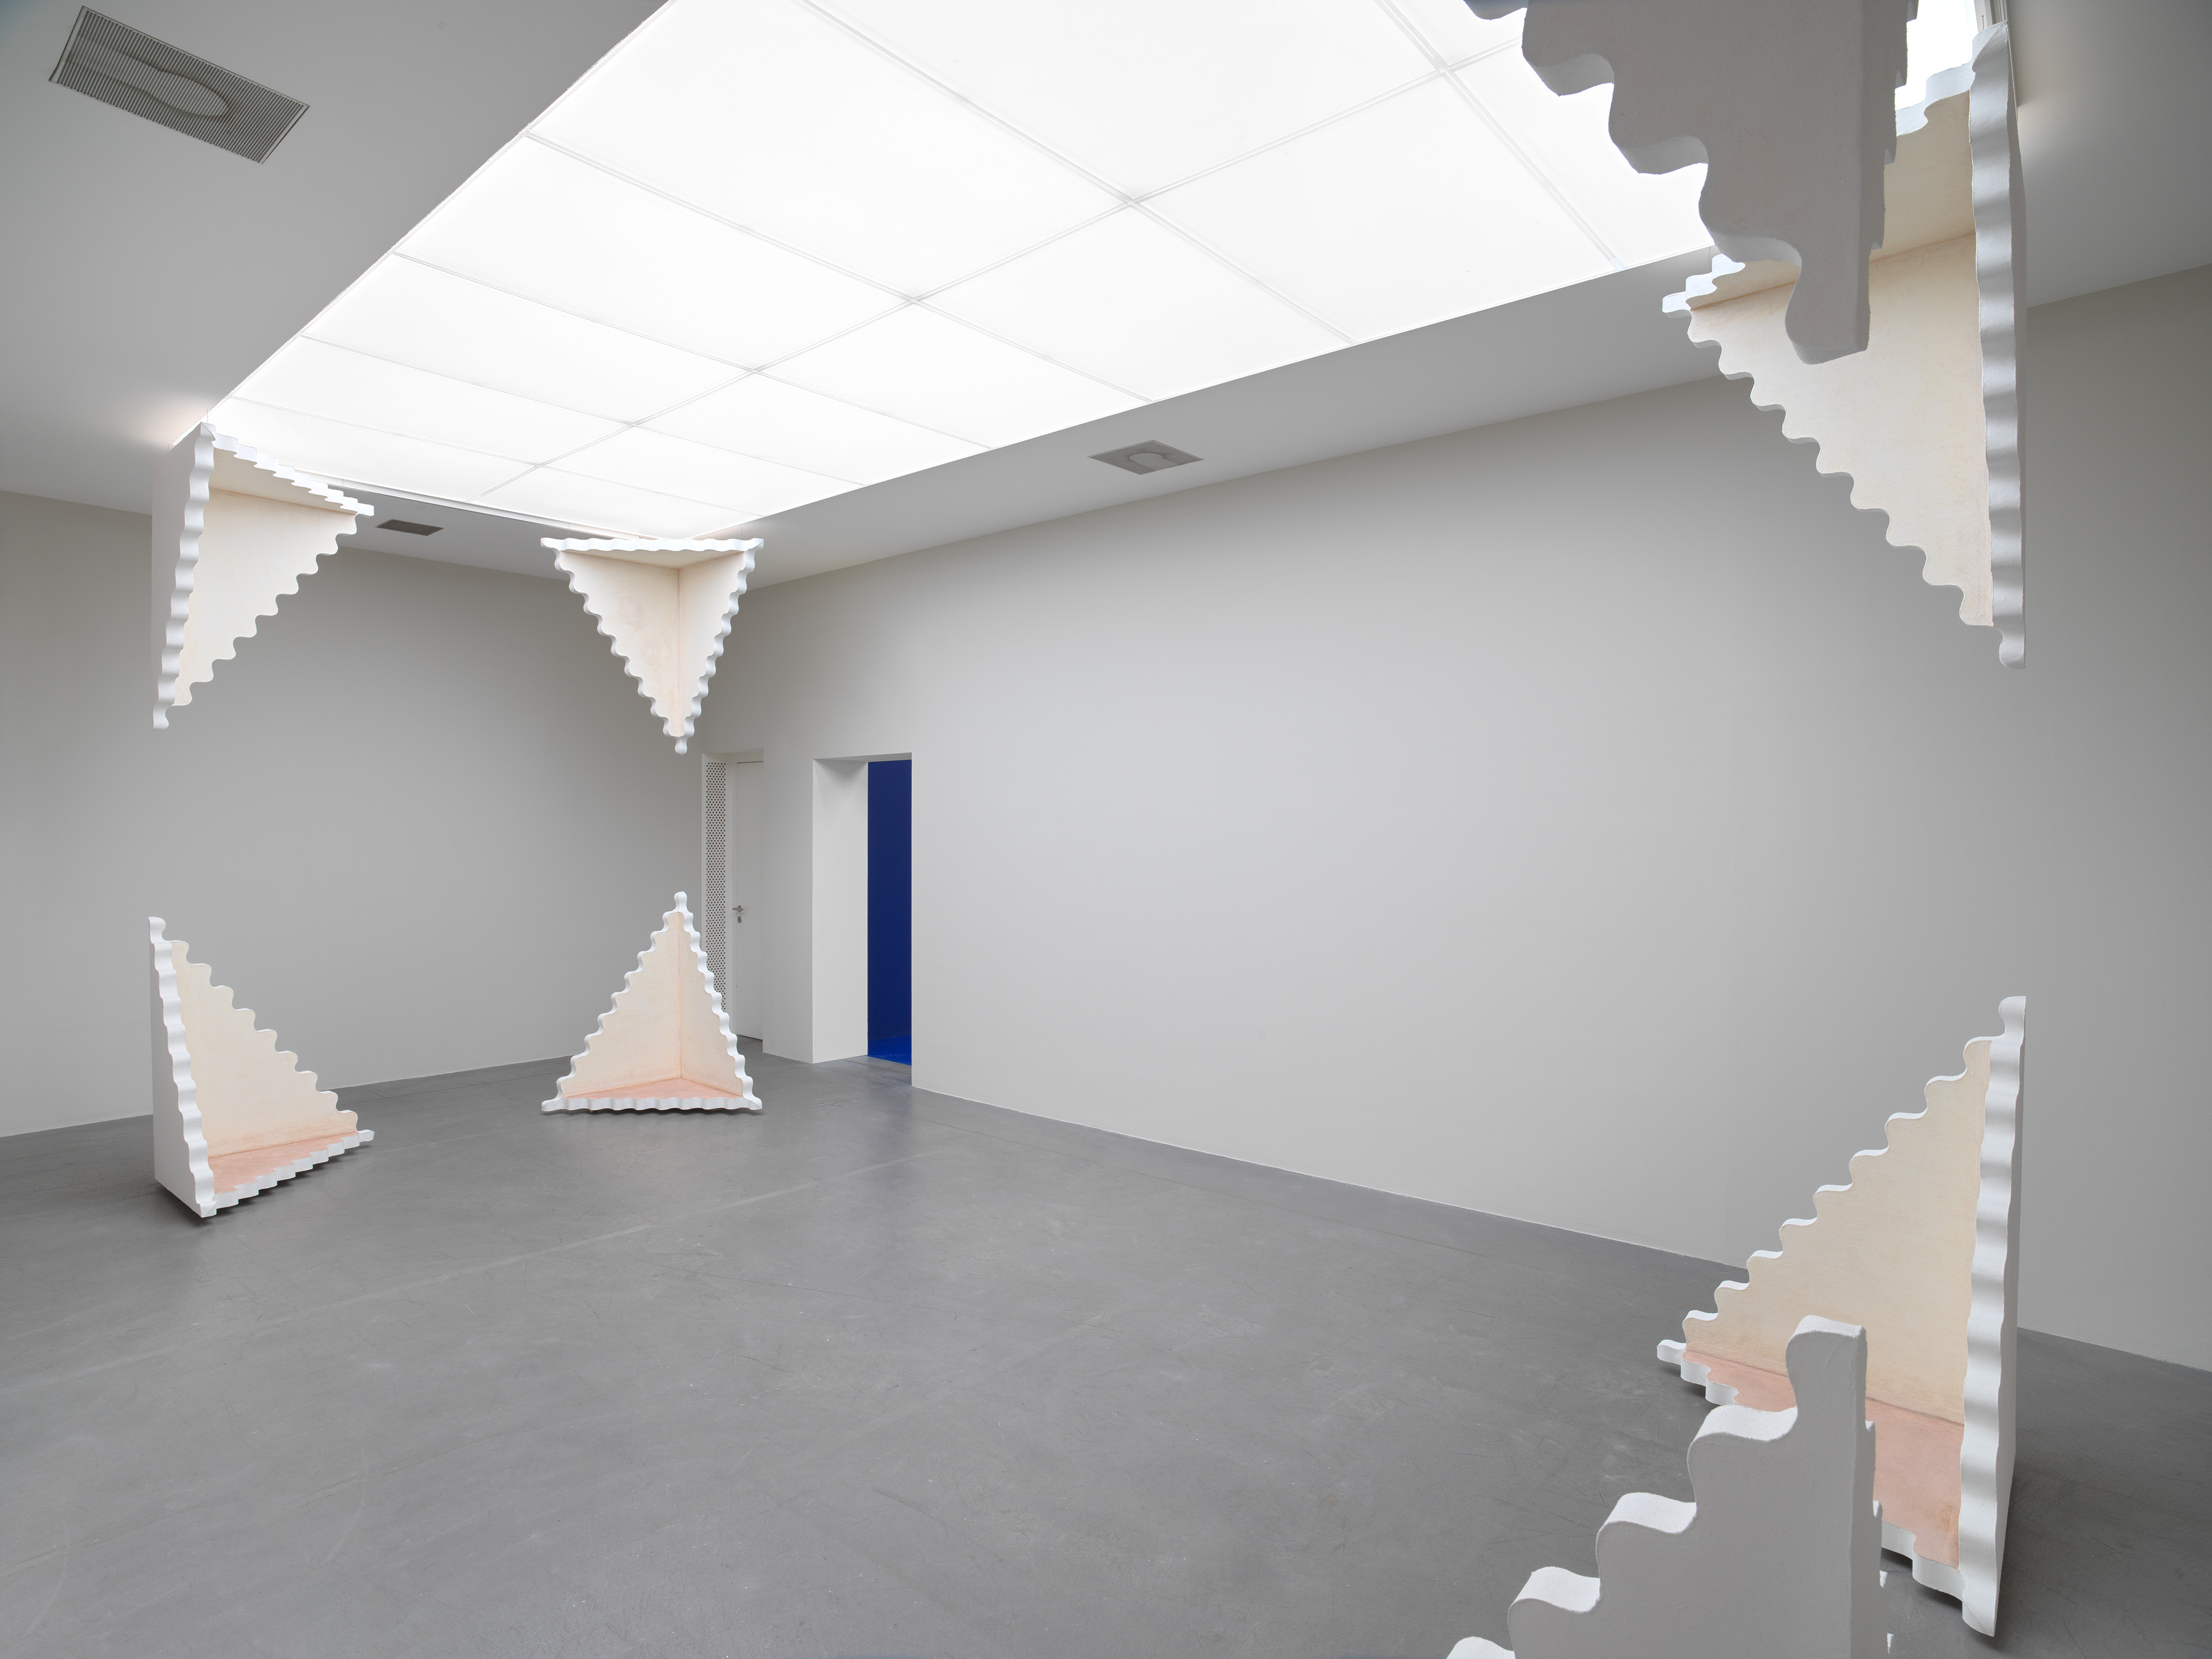 Sam Porritt, Untitled (Where Dust Gathers), 2021. 8 sculptures of gesso on canvas and styrofoam. 123 x 88.5 x 88.5 cm (each). Photographer: Stefan Altenburger.